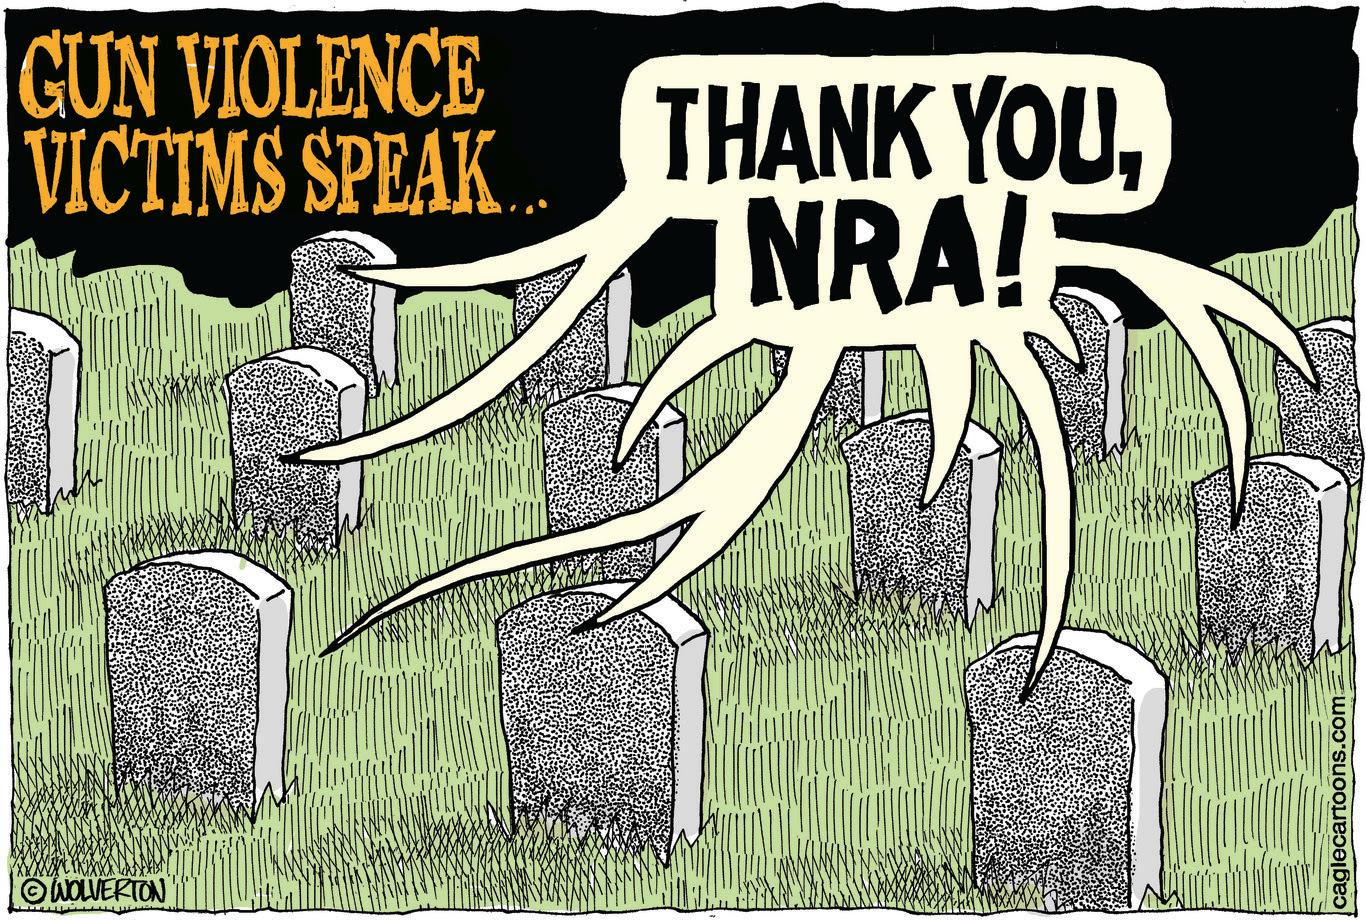 FIREARMS, WEAPONS, NATIONAL RIFLE ASSOCIATION, GUN CONTROL, MASS SHOOTINGS